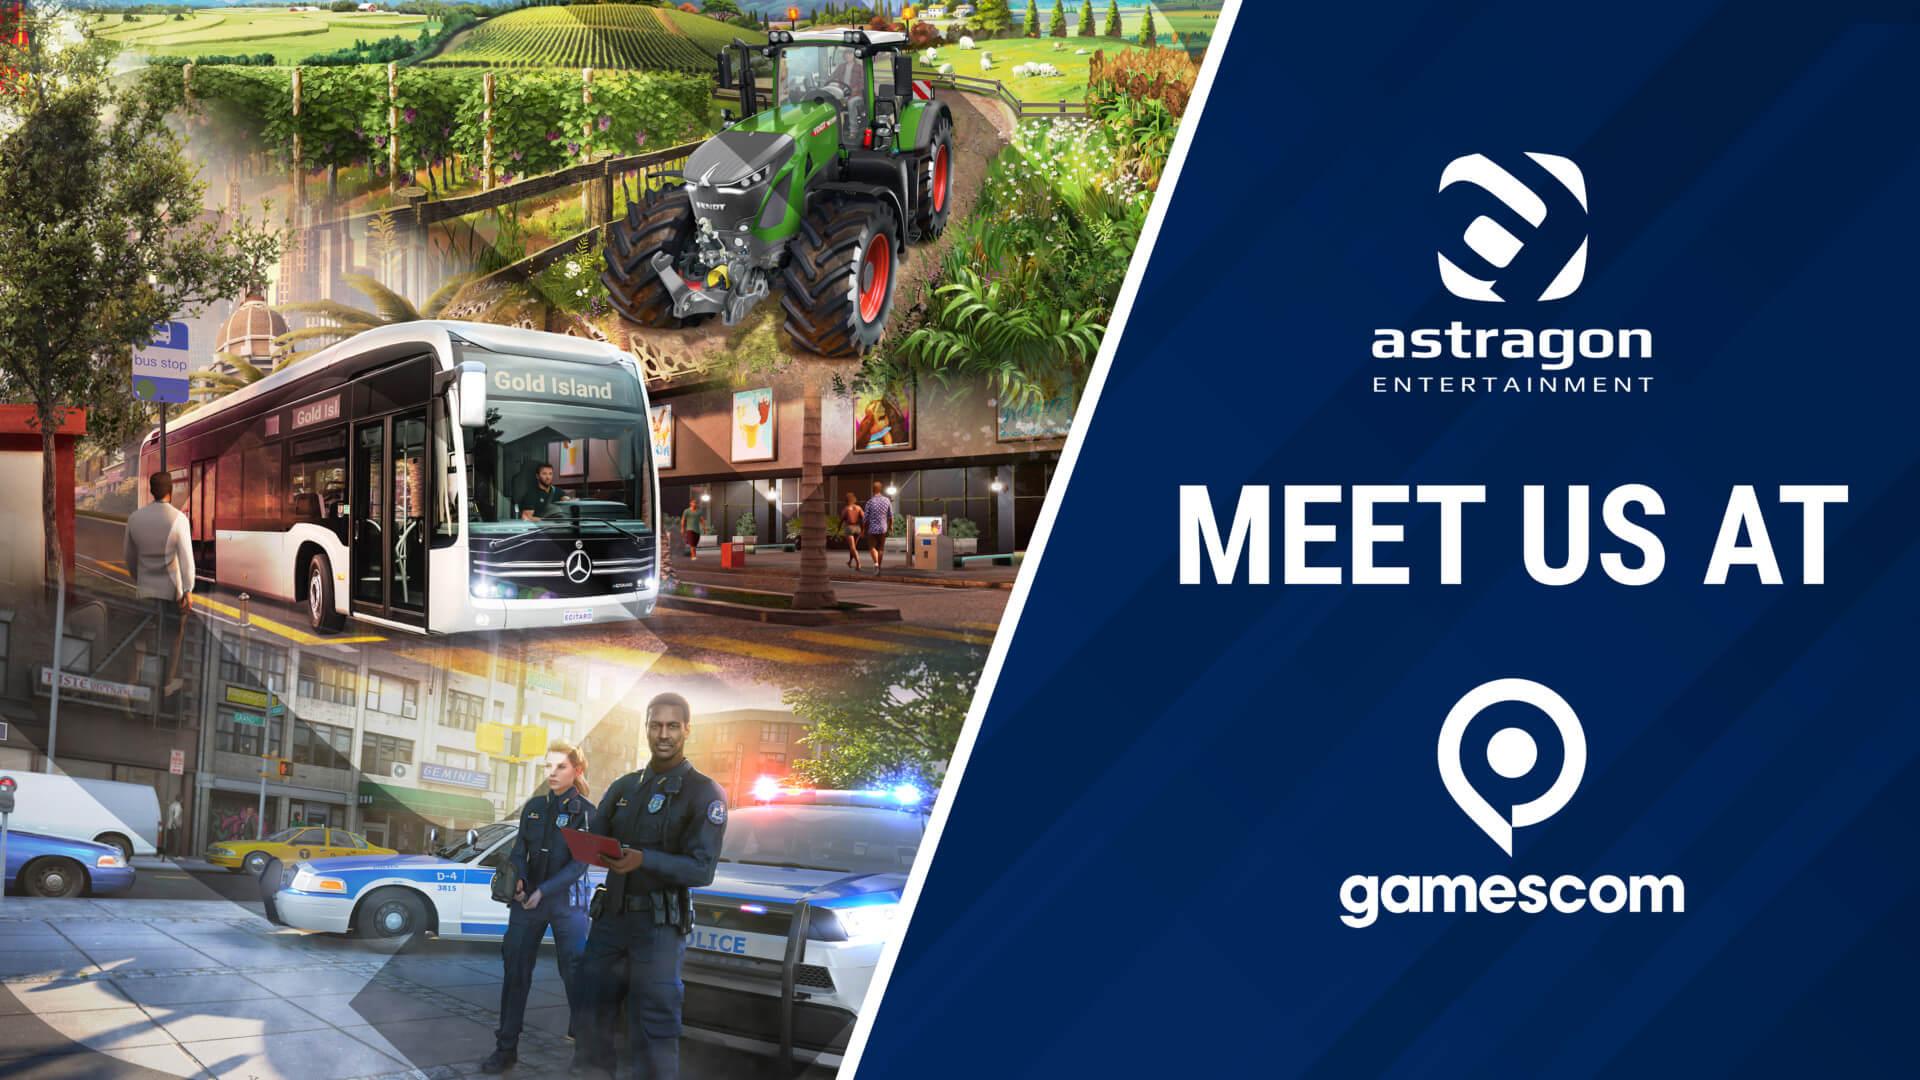 astragon Entertainment gamescom - Keyart